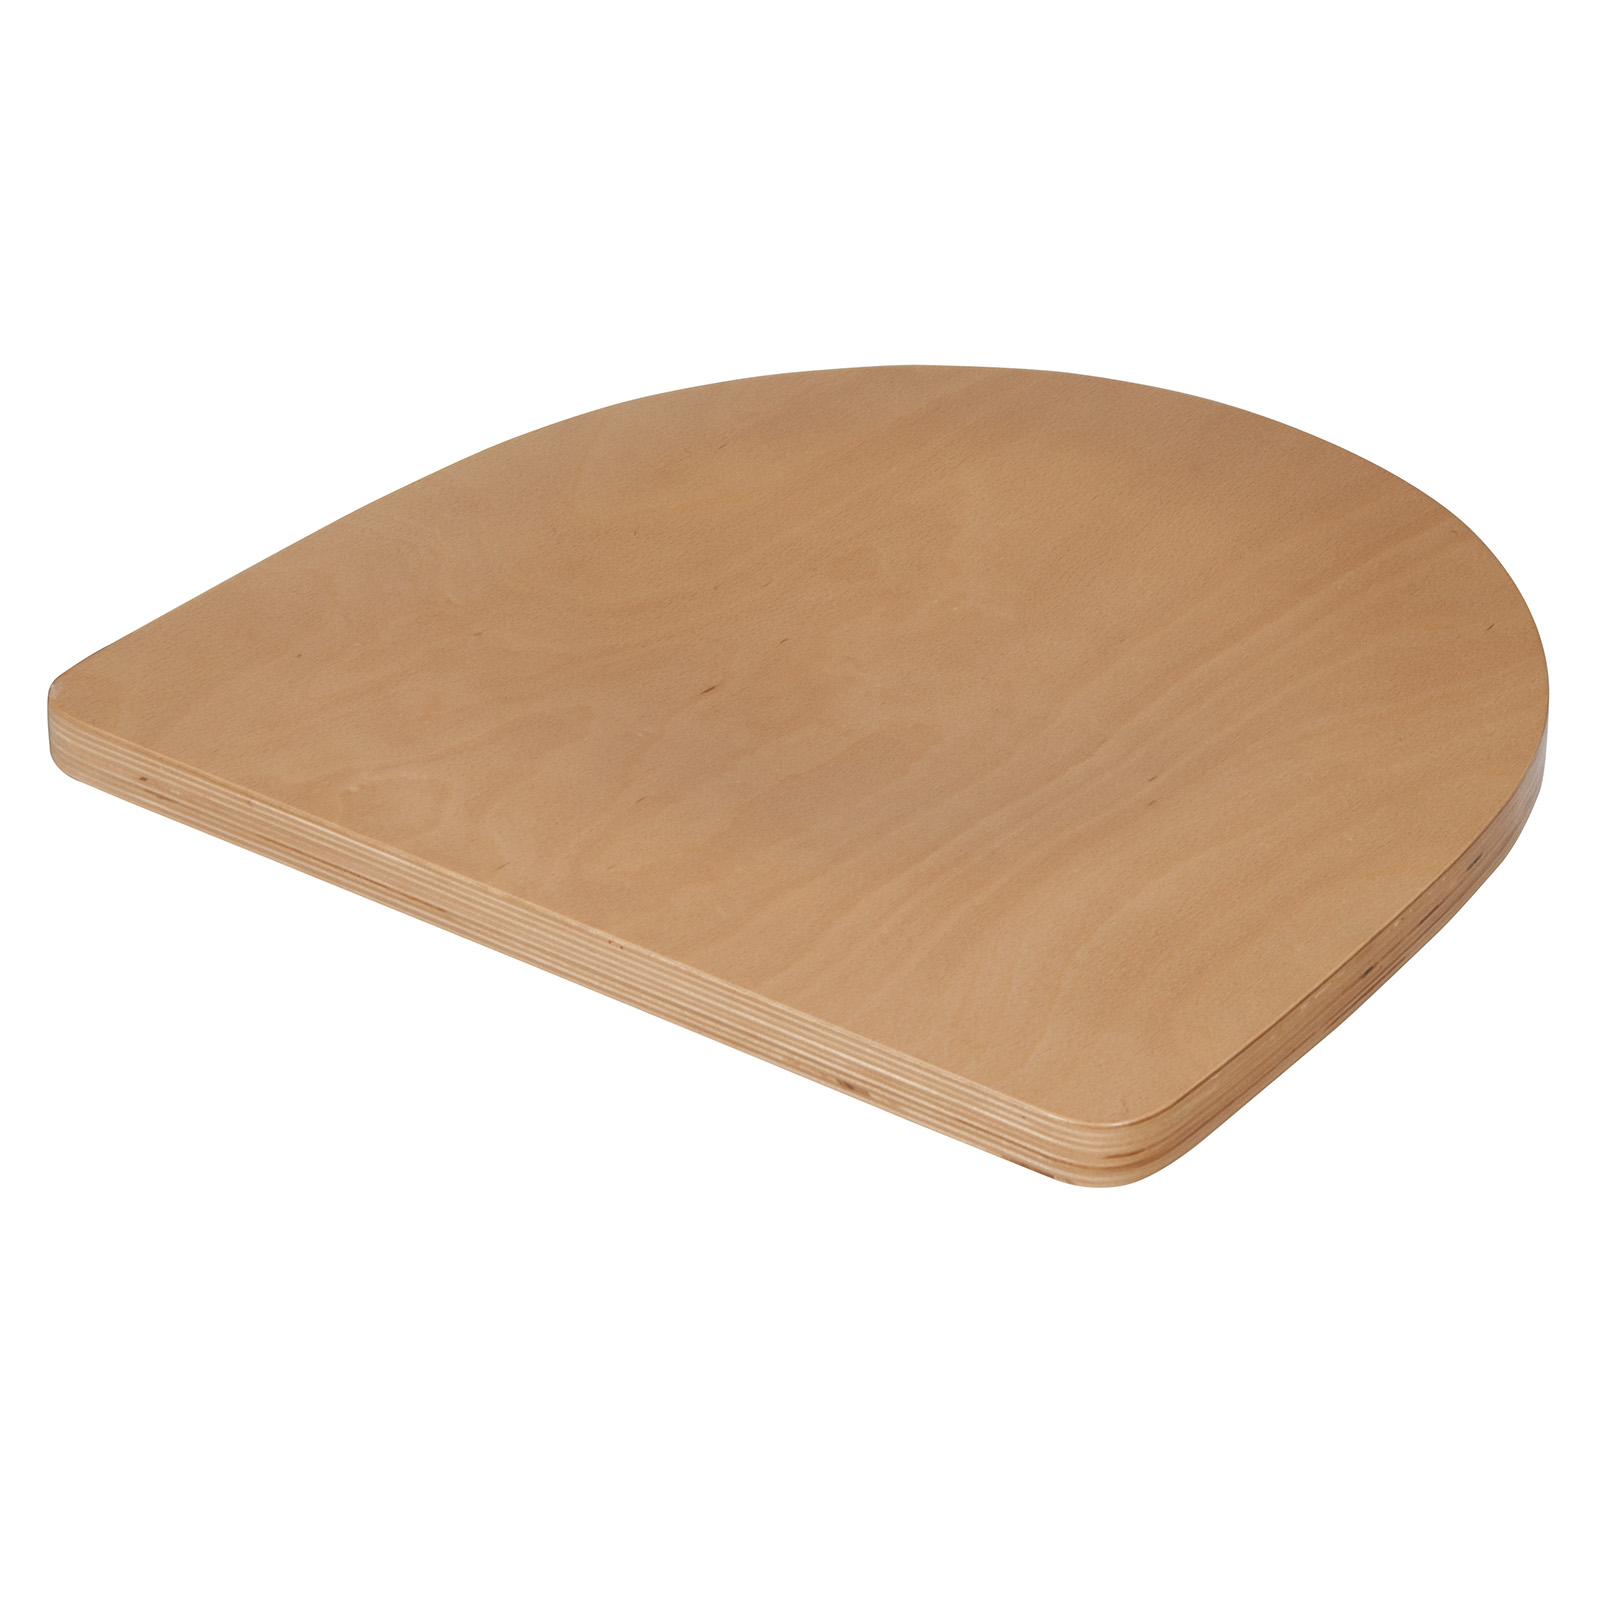 BK Resources BK-BWS-NB chair / bar stool seat